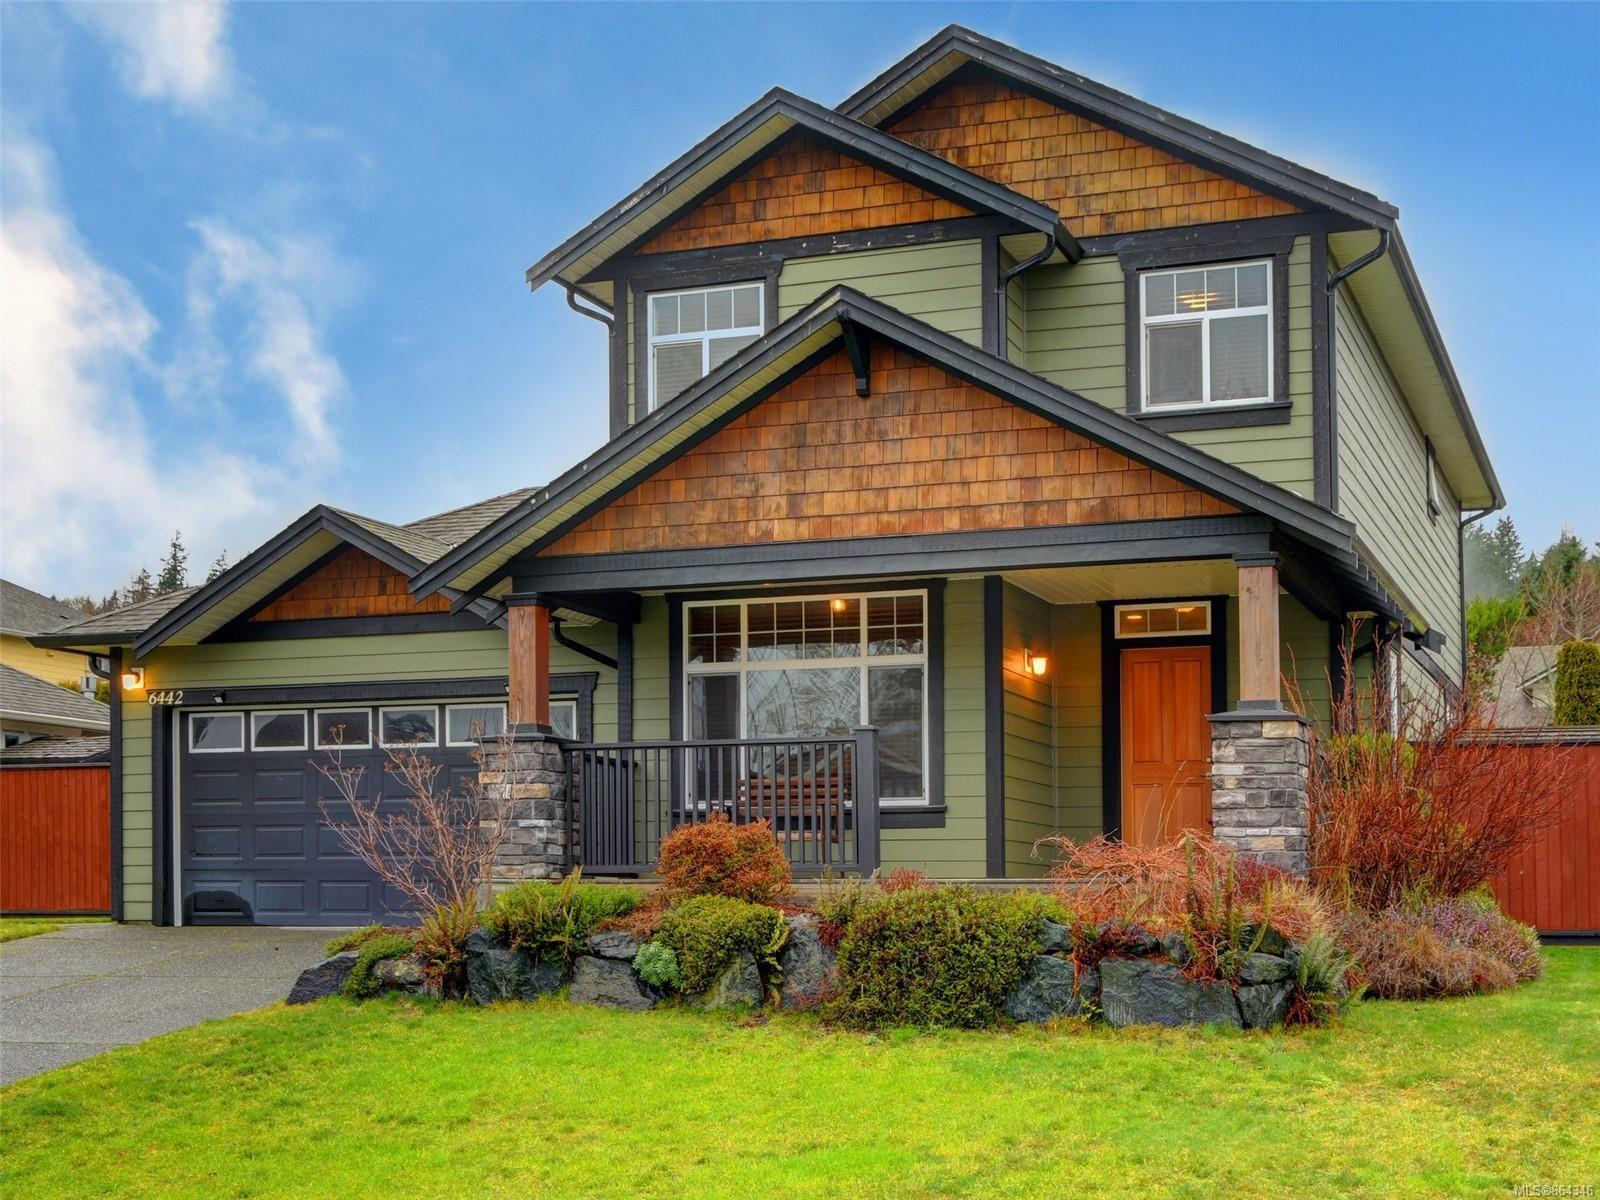 Main Photo: 6442 Birchview Way in Sooke: Sk Sunriver House for sale : MLS®# 864346